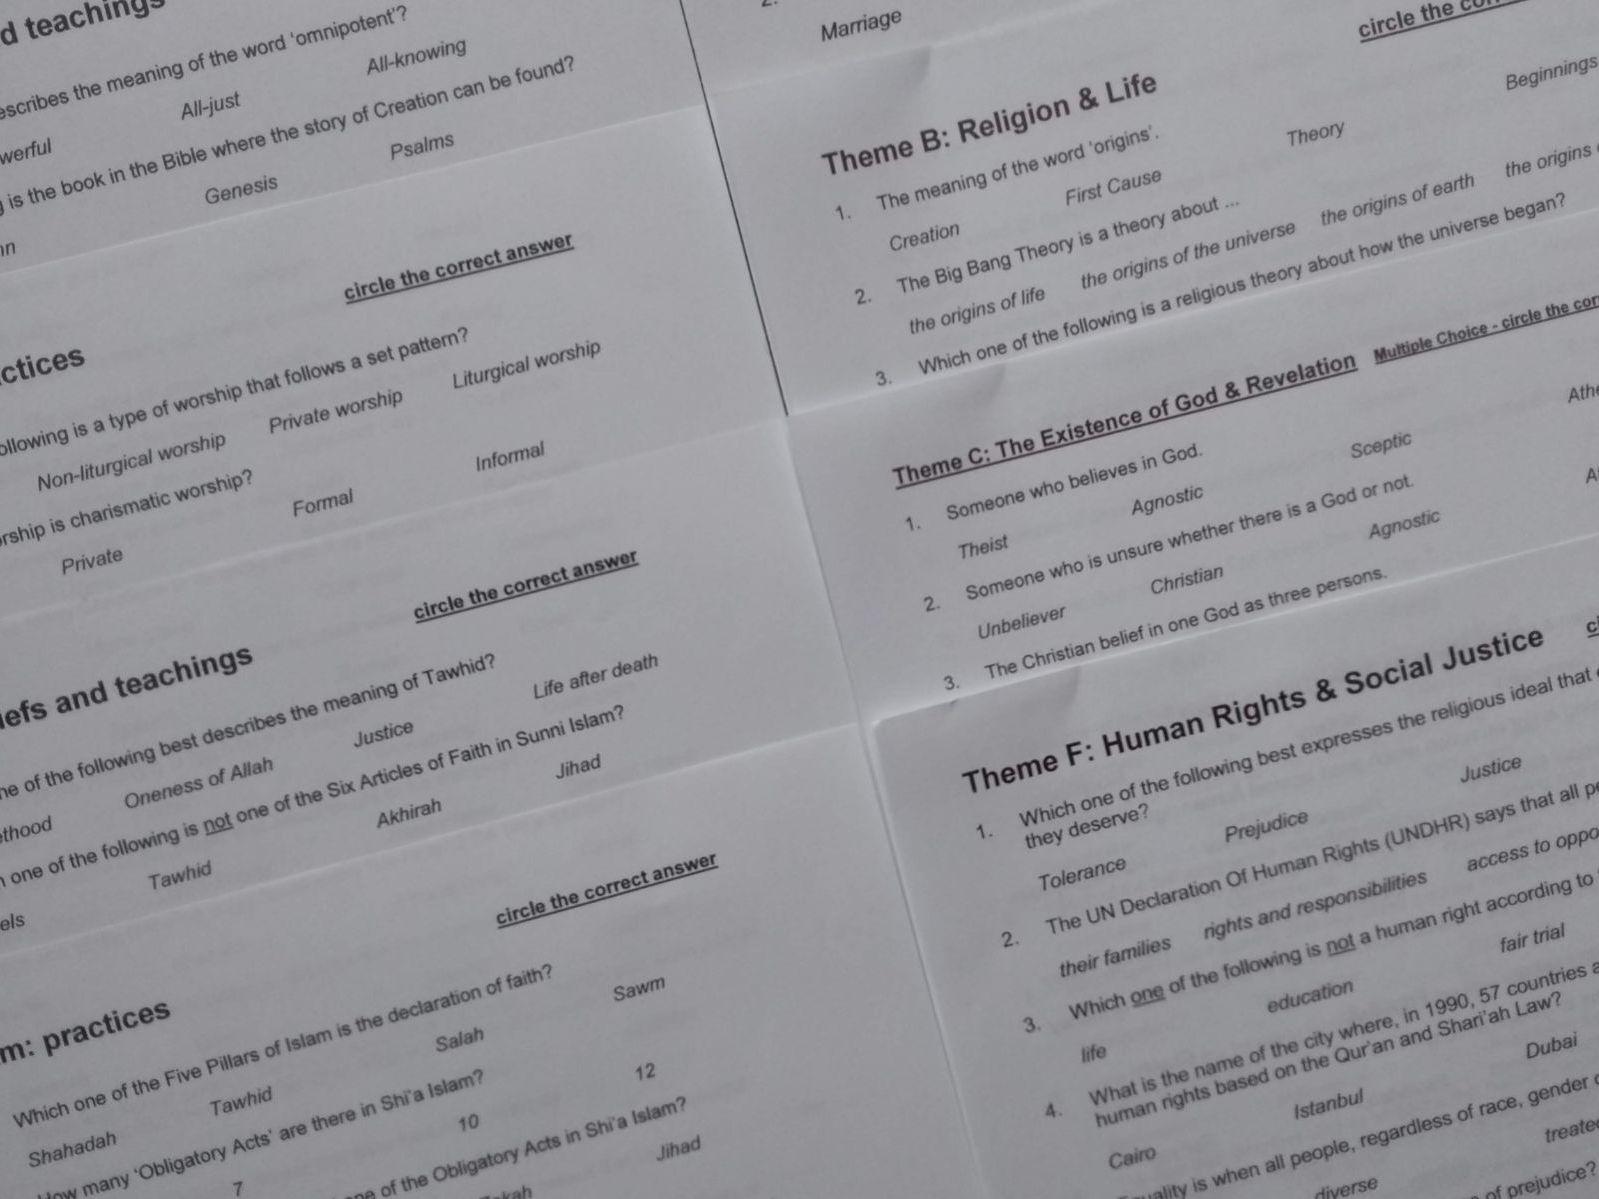 Religions & Themes bundle for AQA GCSE Religious Studies Paper 1 & 2A